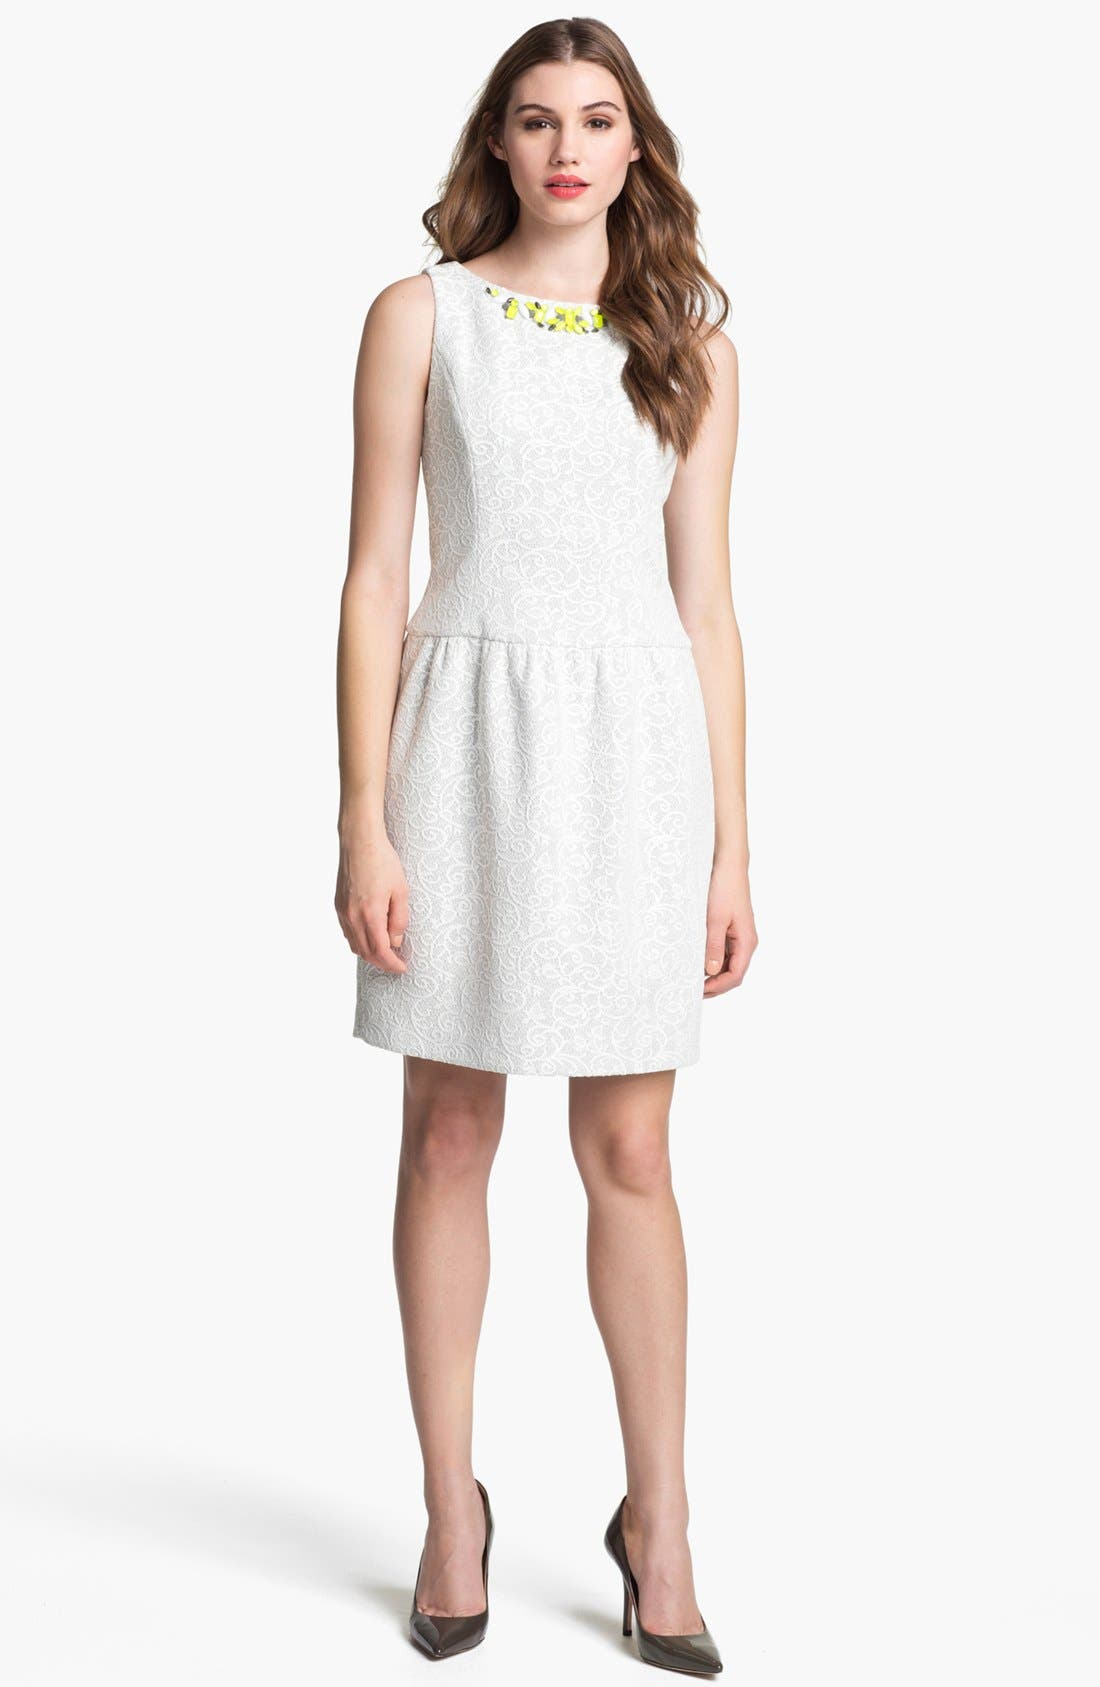 Main Image - Ivy & Blu Embellished Knit Lace Dress